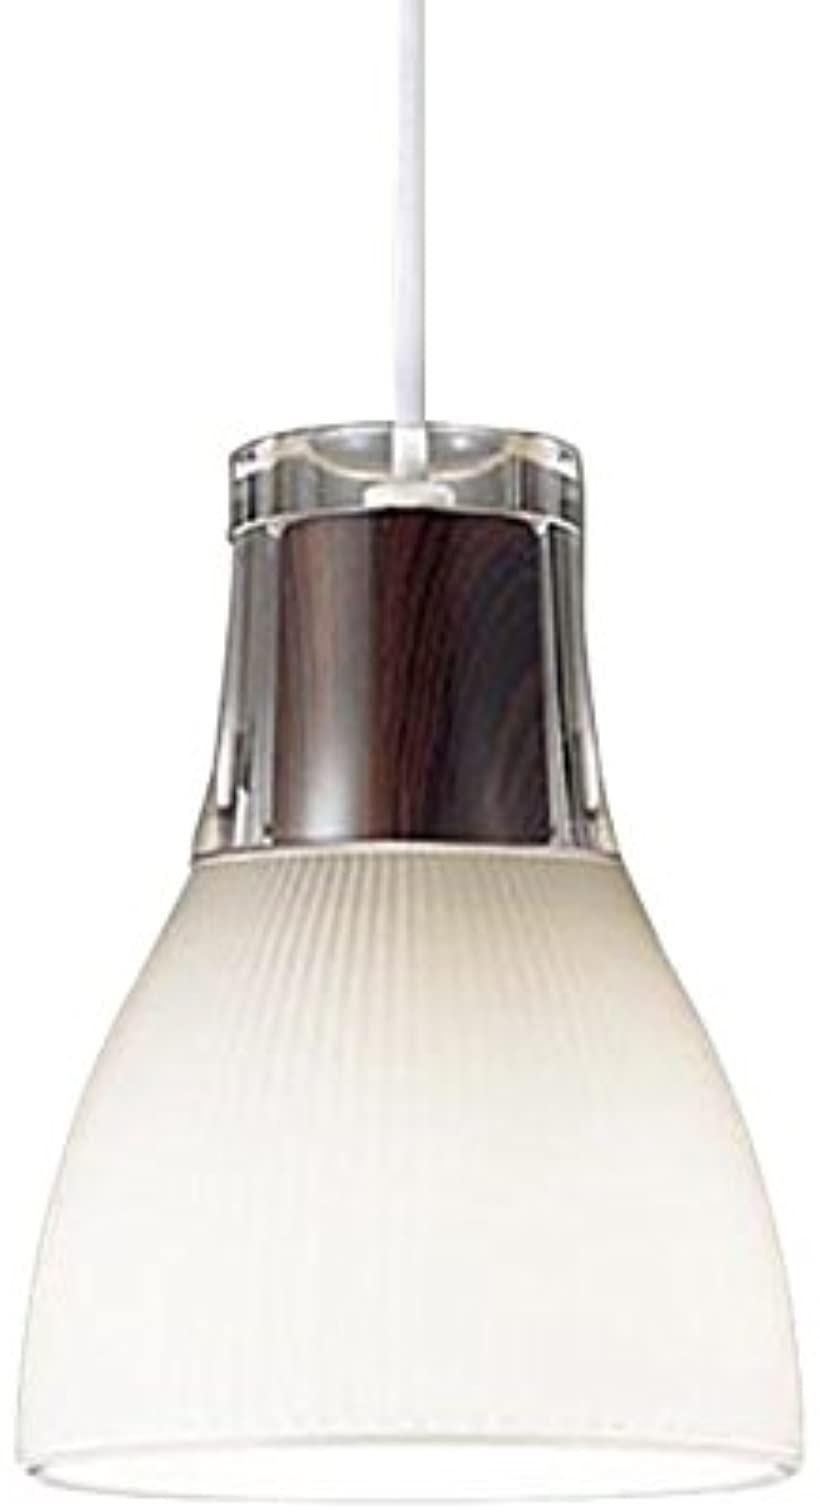 LED ペンダント 配線ダクト取付型 小型 LDA5×1 電球色 Bluetooth対応 LGBX10003